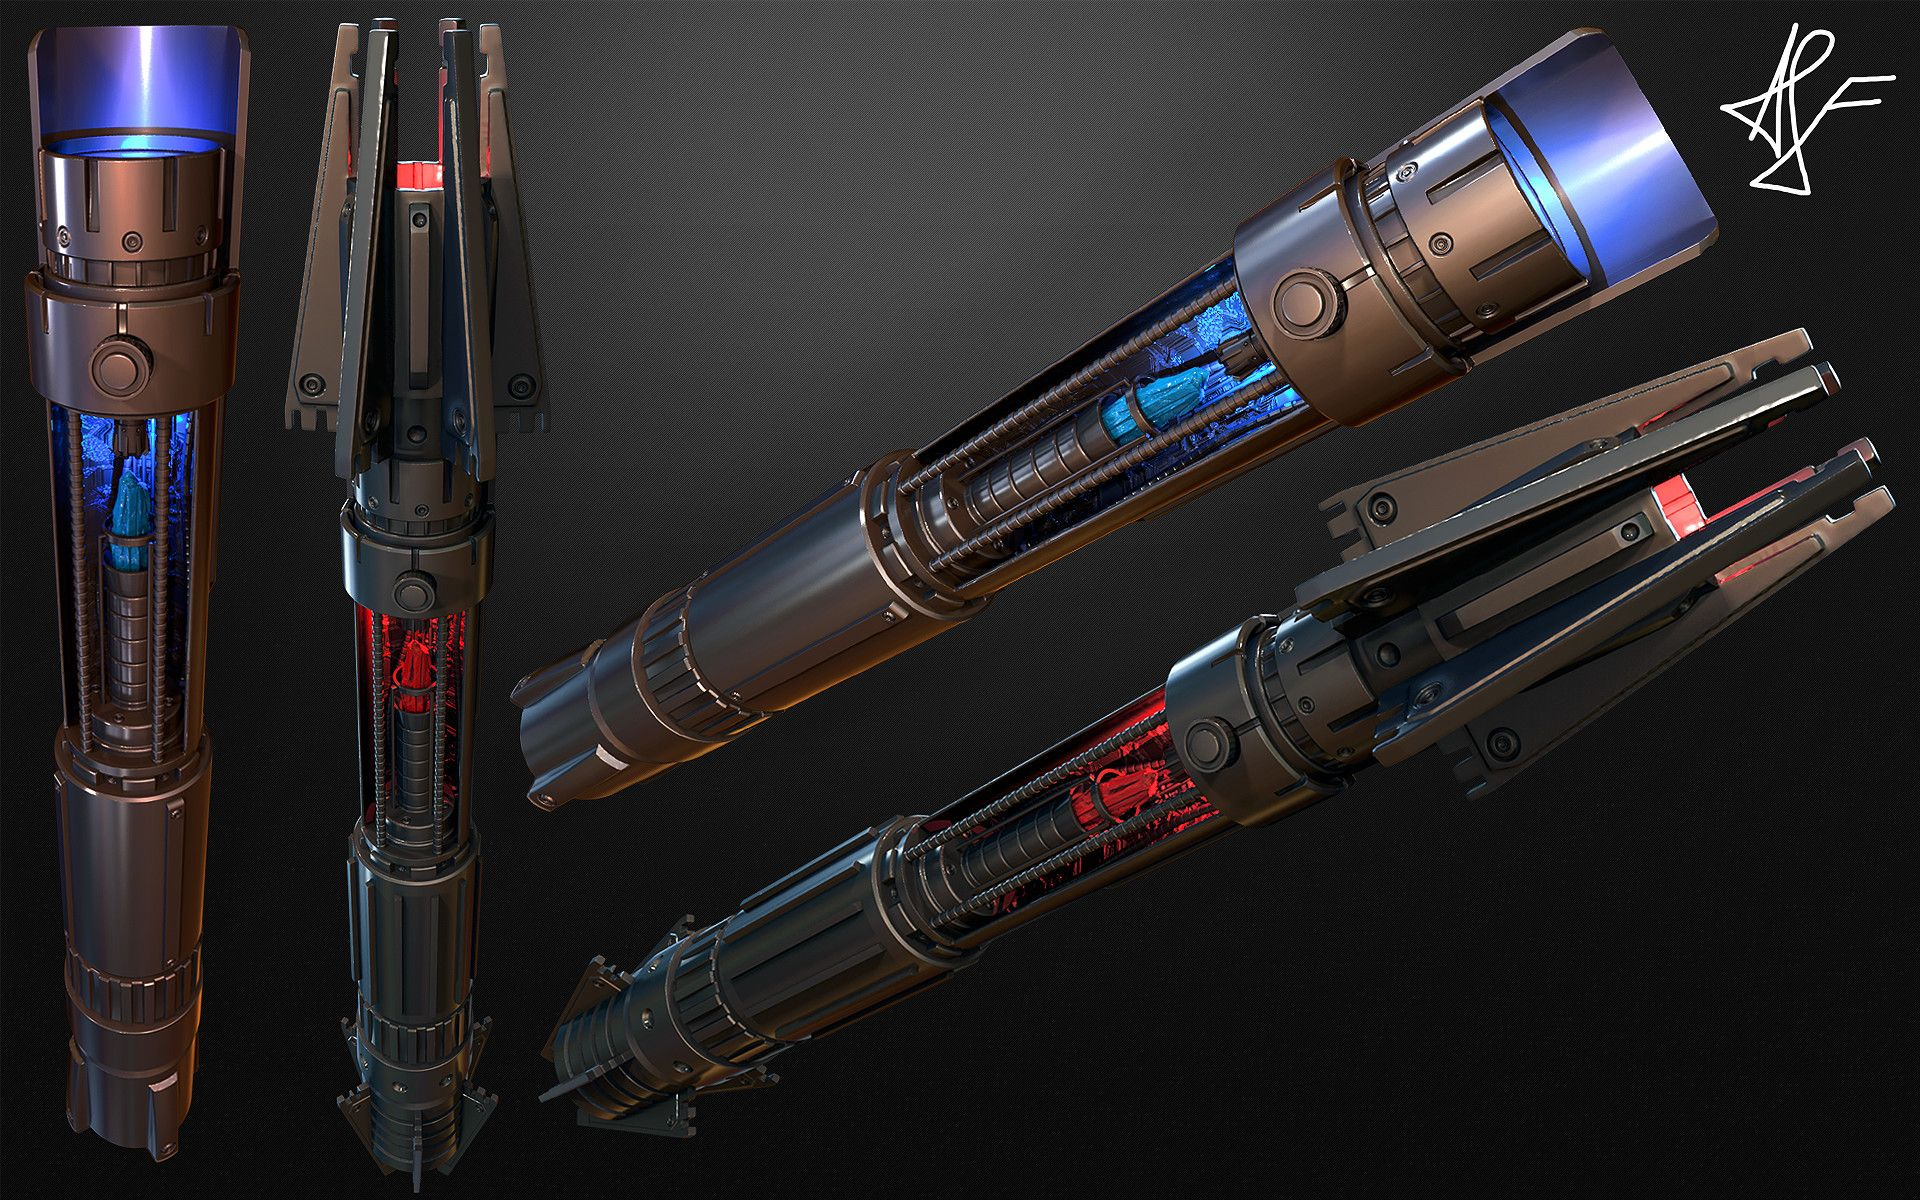 Lightsaber Fan Art Star Wars Light Saber Lightsaber Star Wars Fan Art